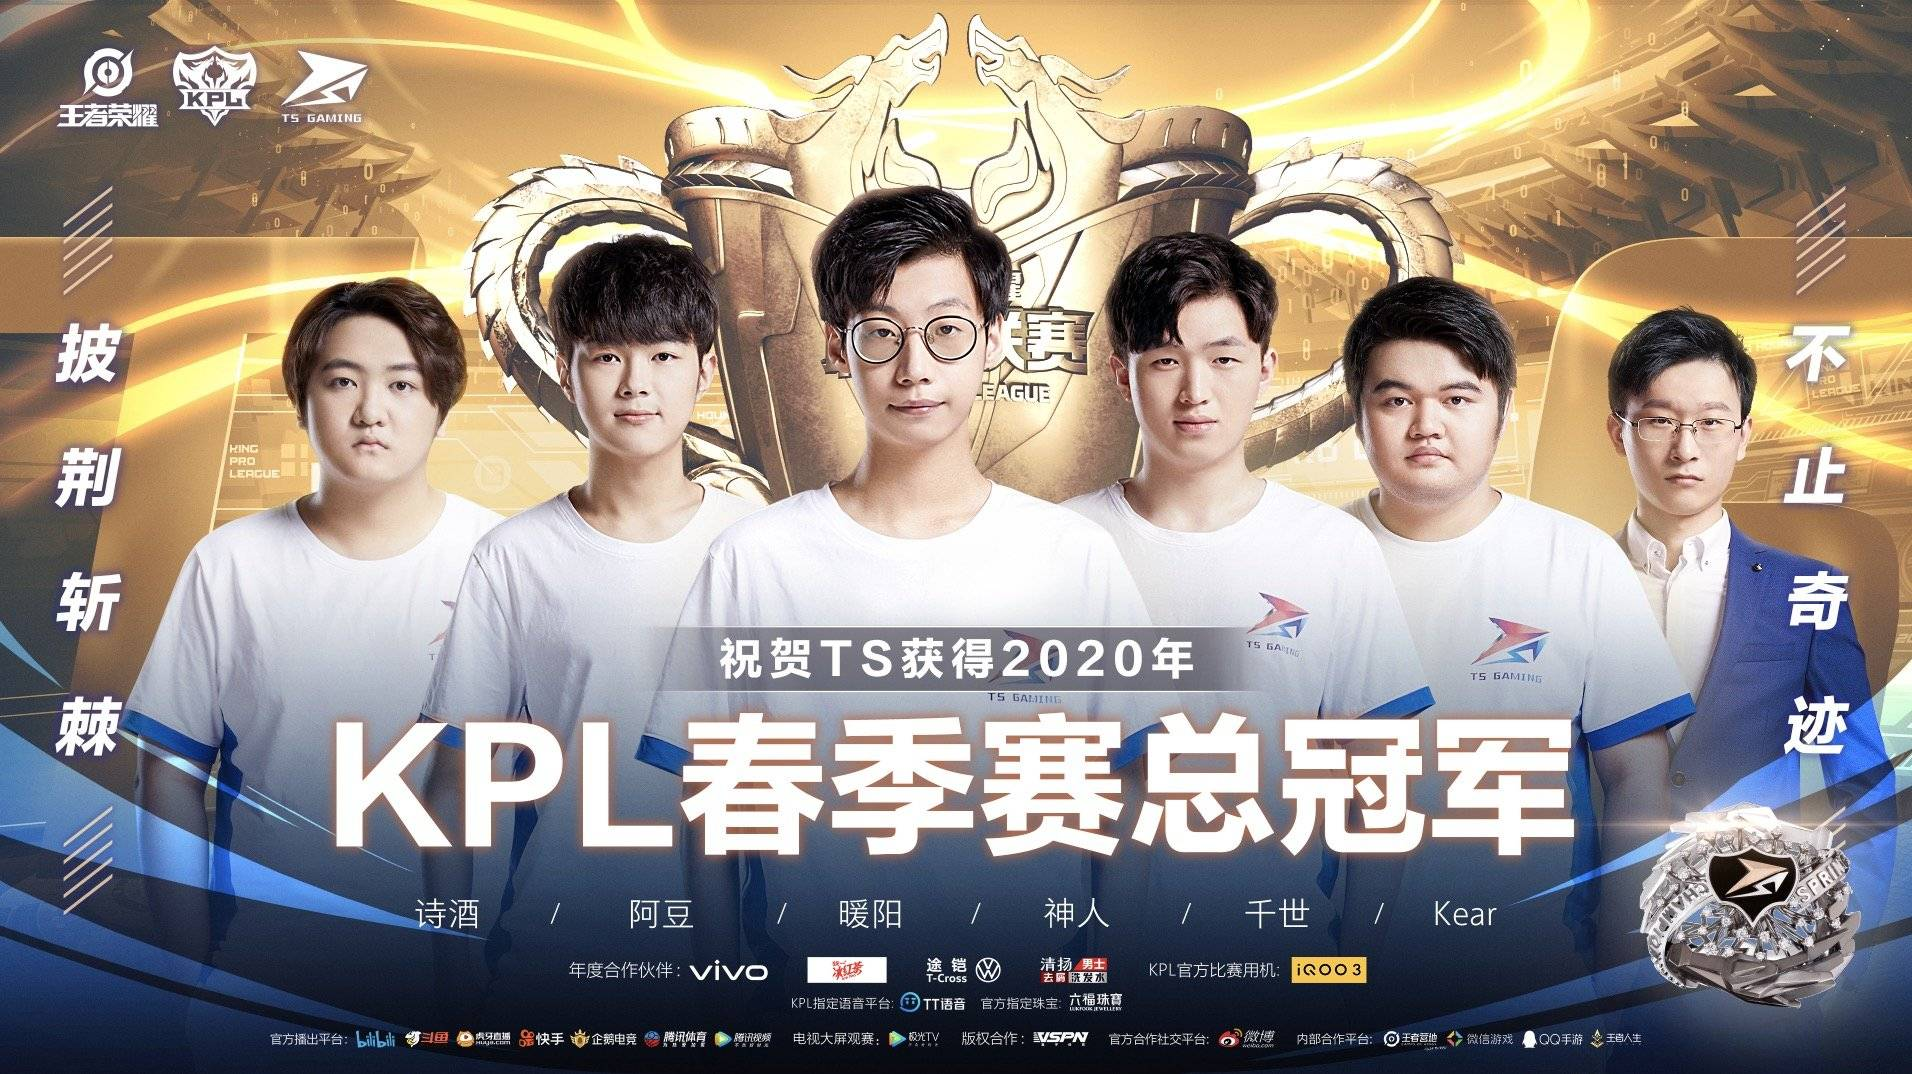 KPL春决:TS迎风化龙十三连胜新王登顶 暖阳获FMVP